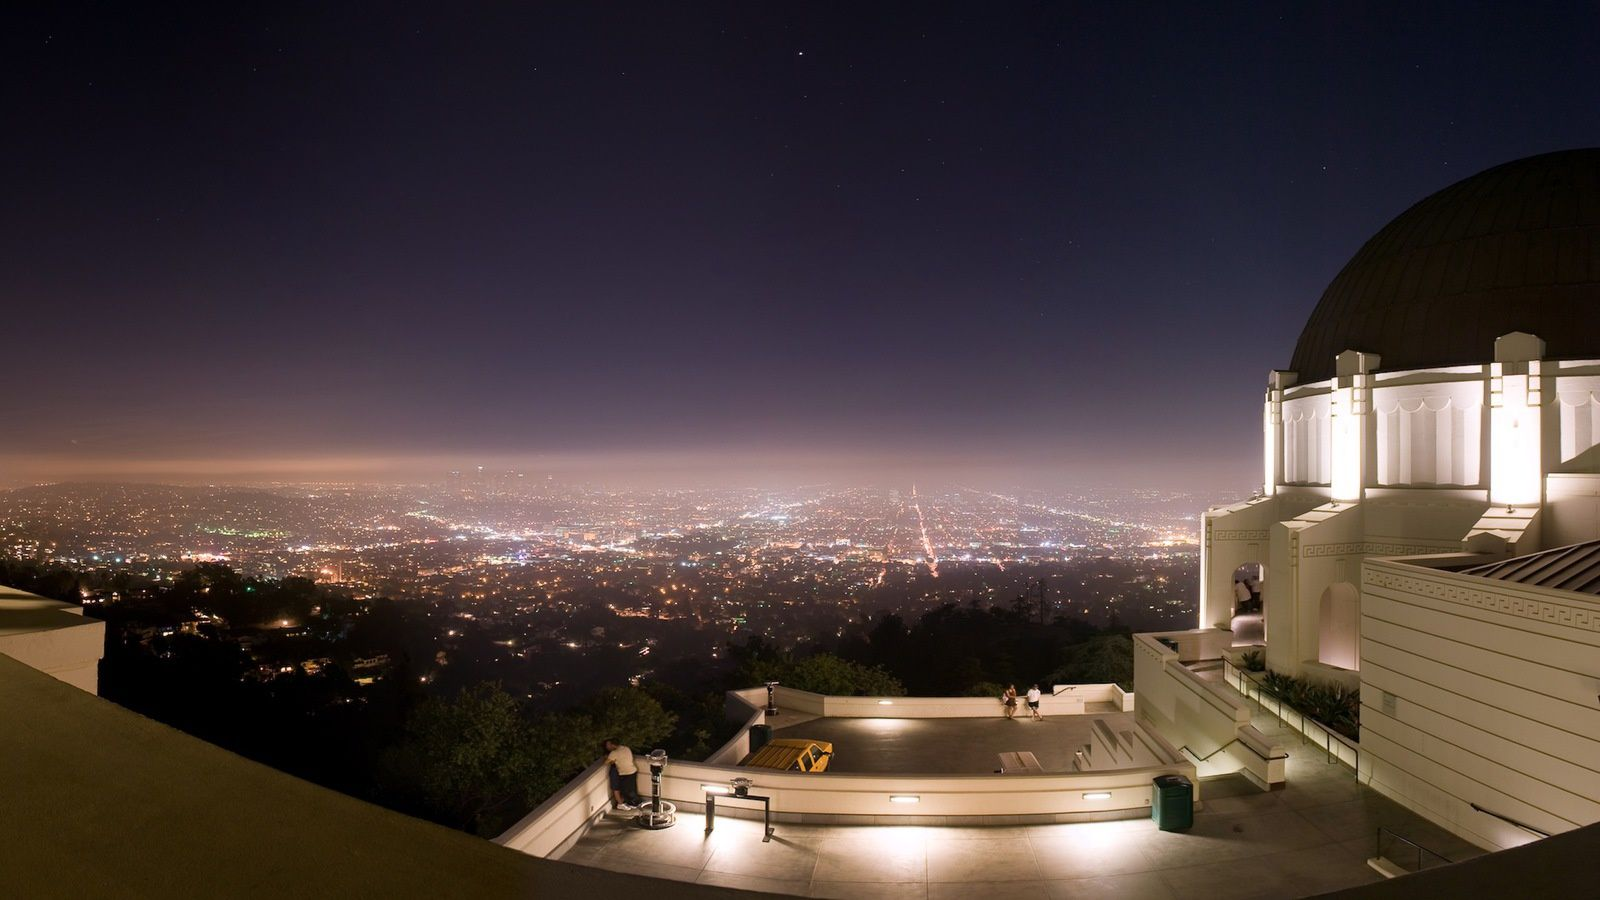 Los Angeles - Nuit - Wallpapers - Free